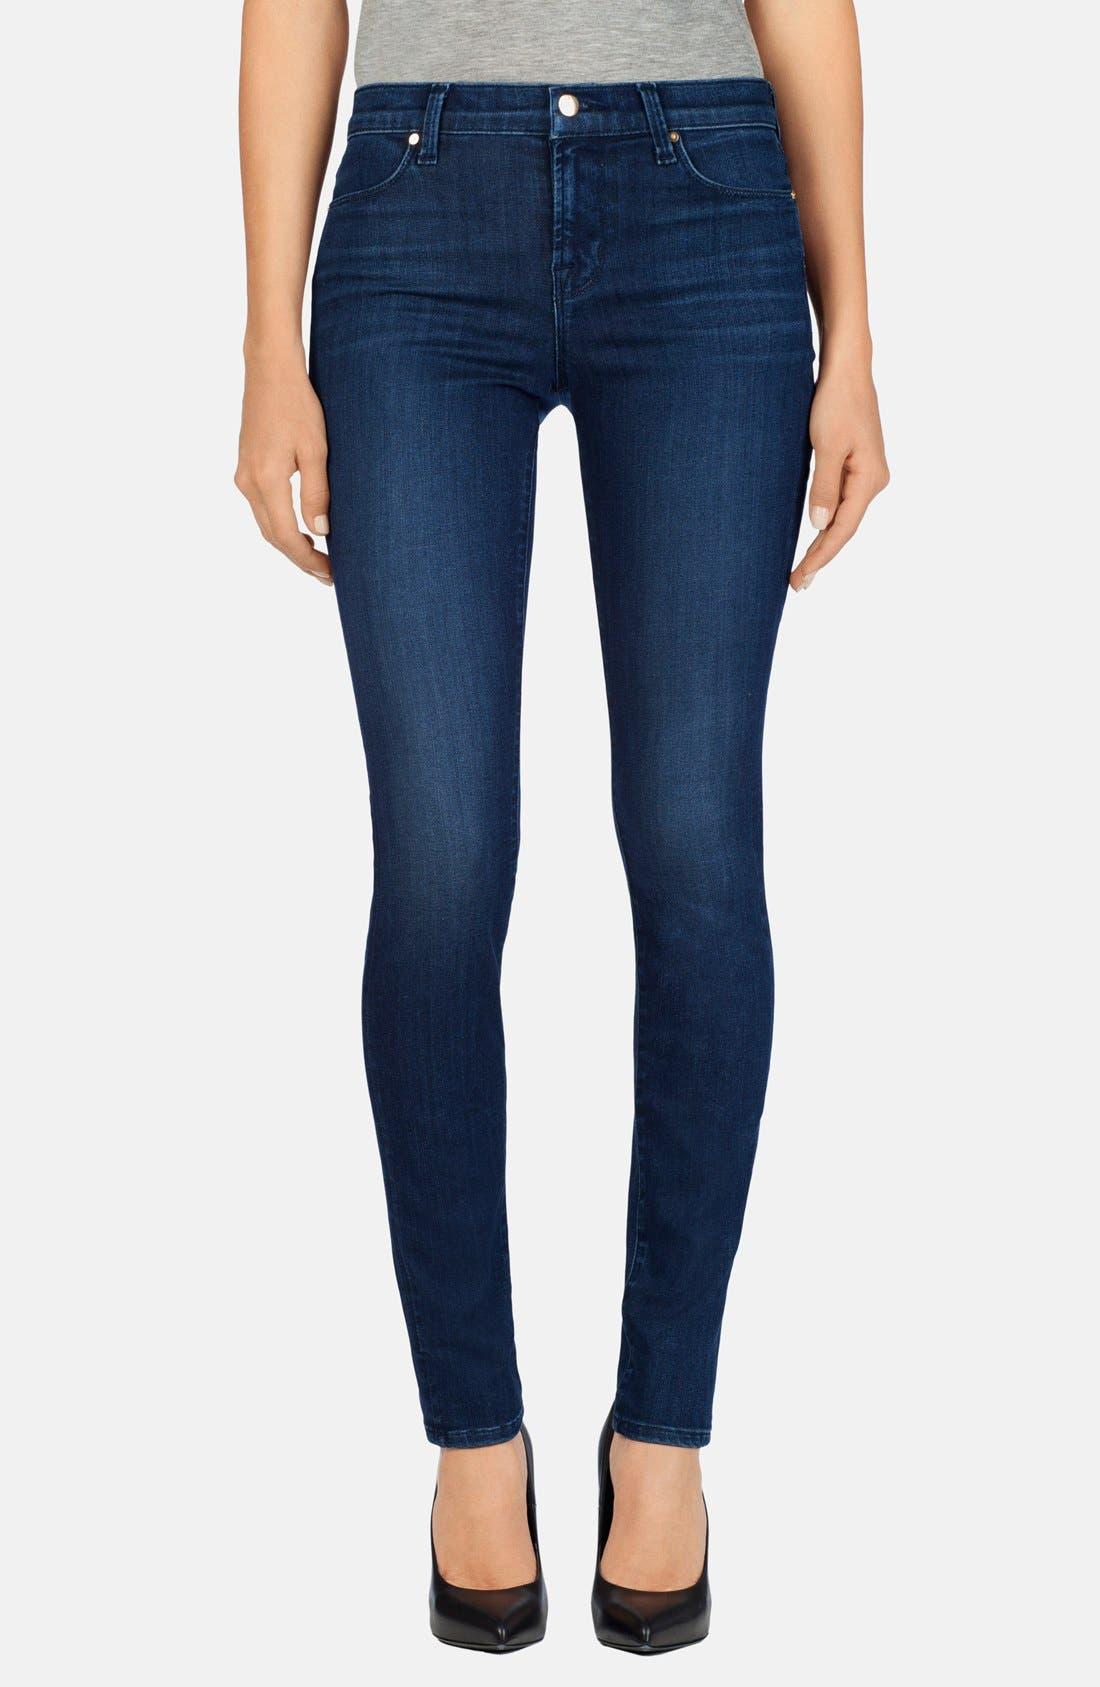 Main Image - J Brand '620' Mid Rise Skinny Jeans (Fix)